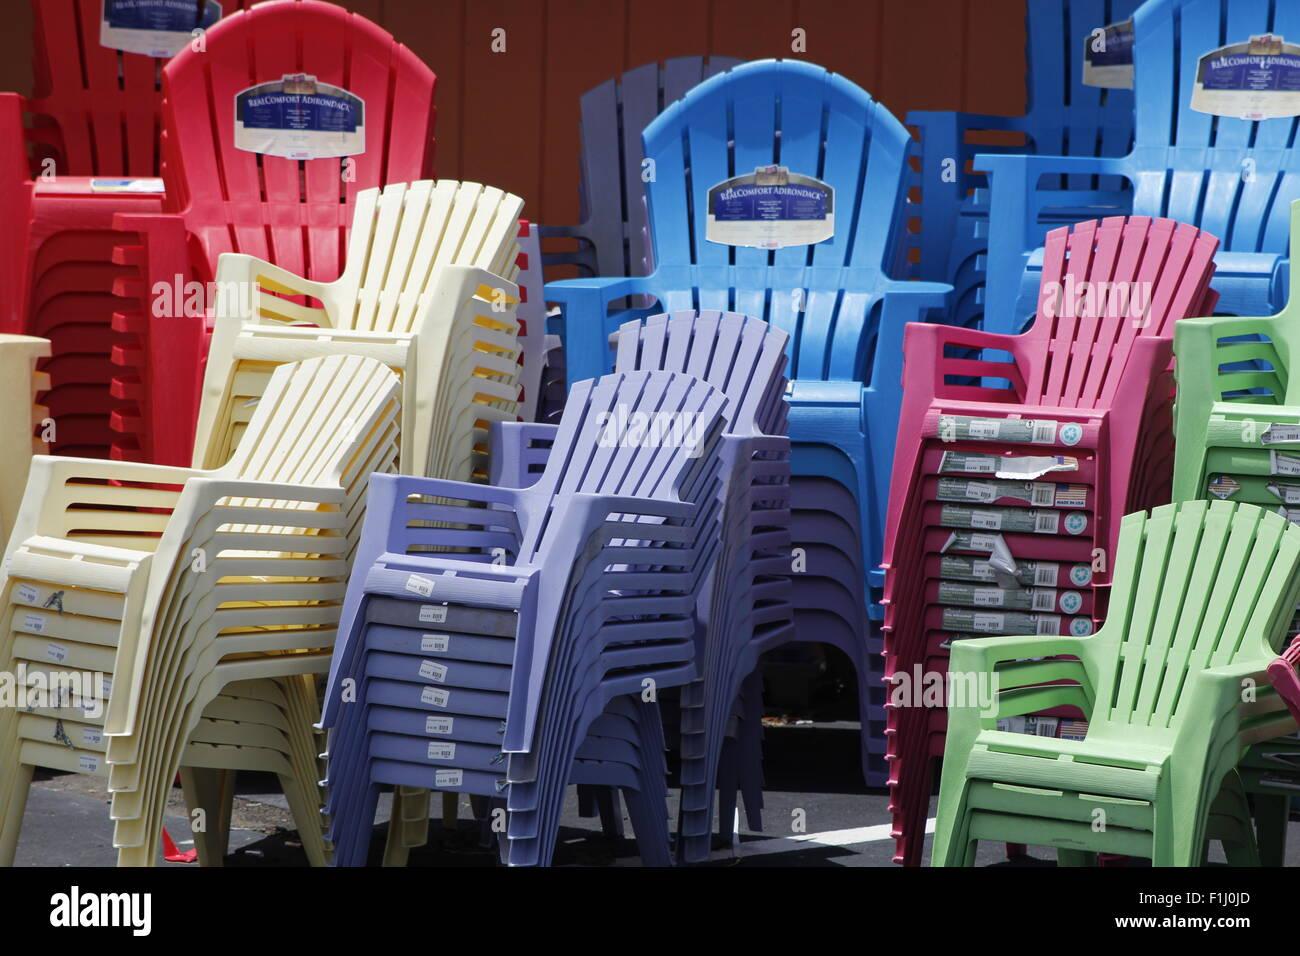 Sedie Di Plastica Colorate.Colorate Sedie Di Plastica Impilate Foto Immagine Stock